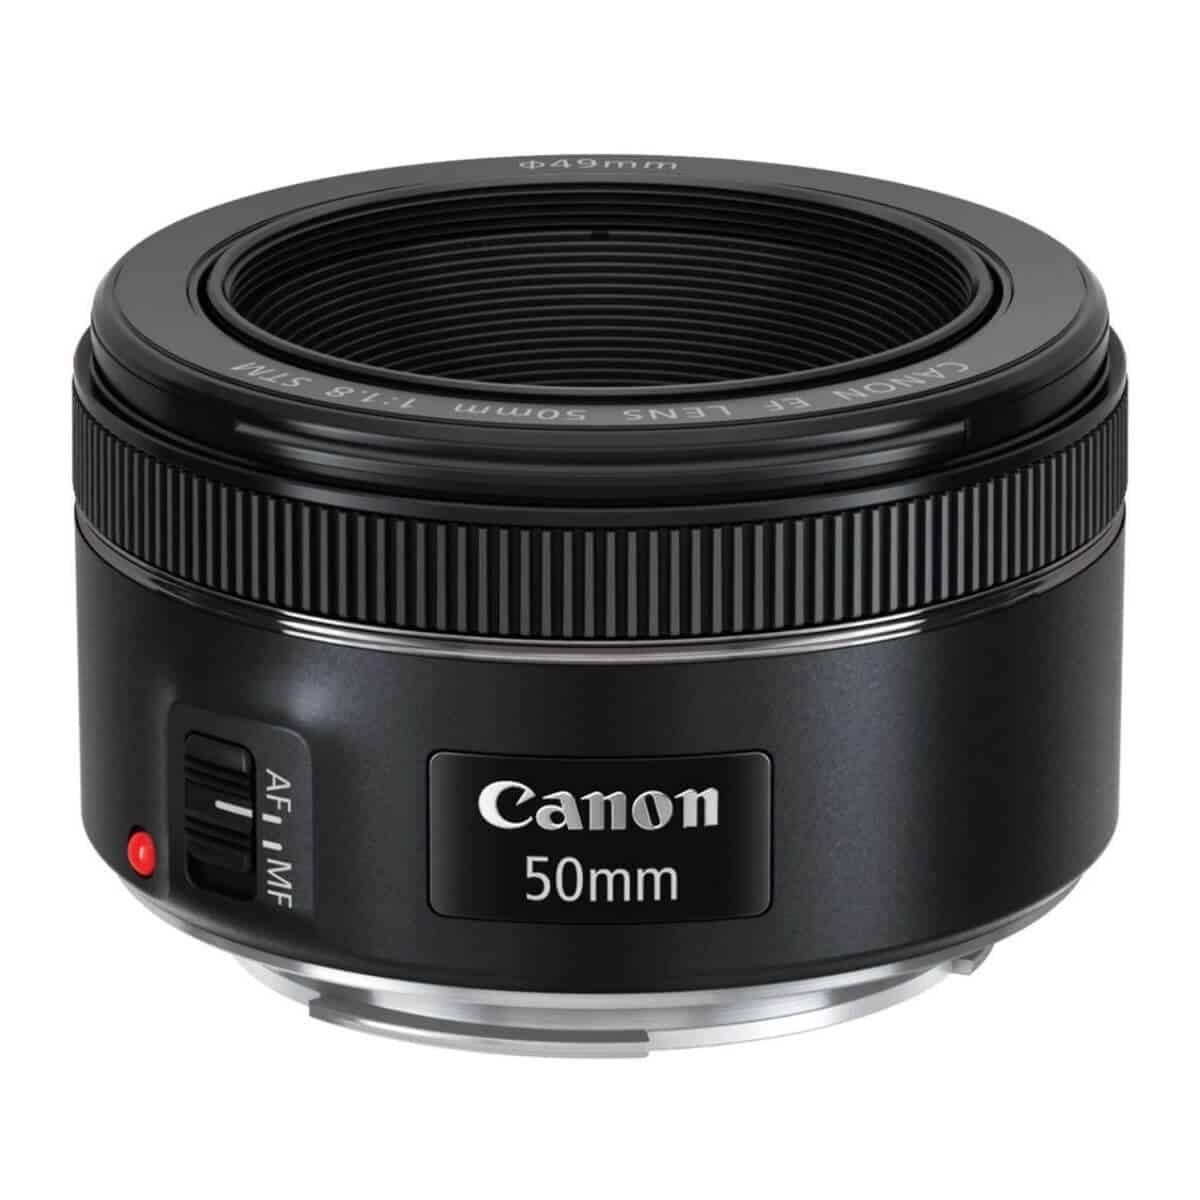 Canon 50mm f/1.8 camera lens.